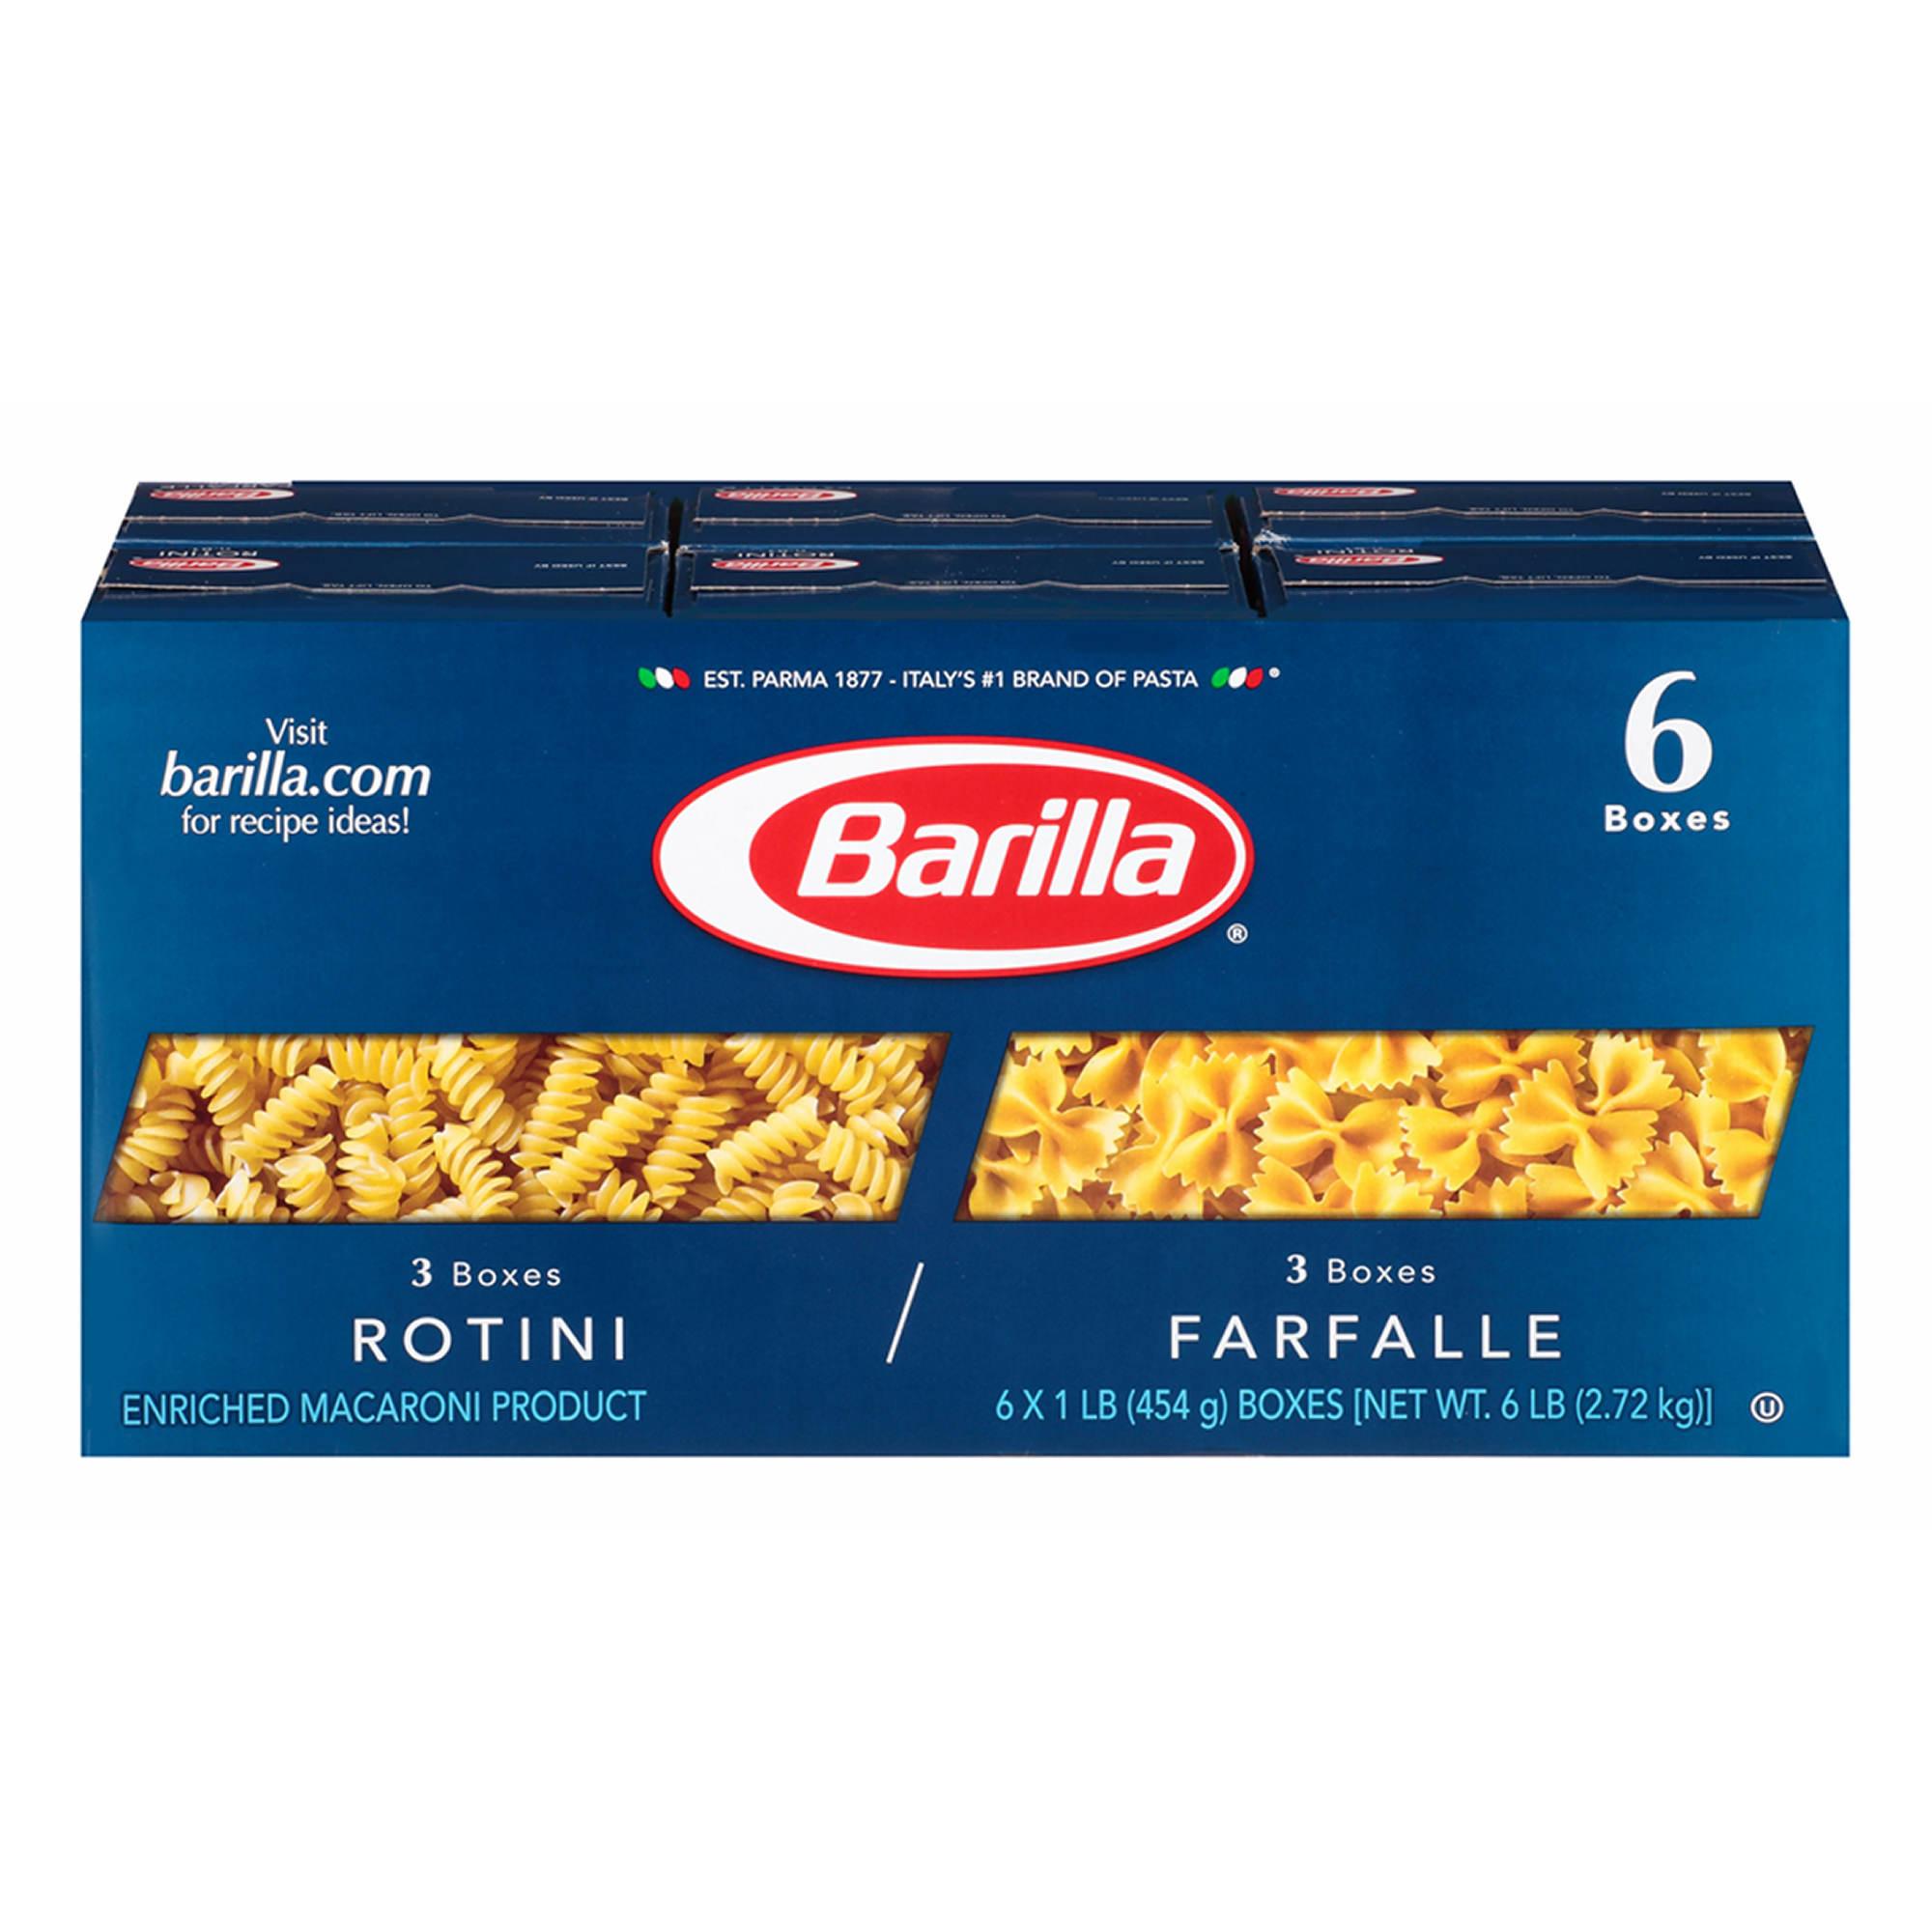 barilla rotini and farfalle pasta 16 oz 6 pk bj s whole club barilla rotini and farfalle pasta 16 oz 6 pk